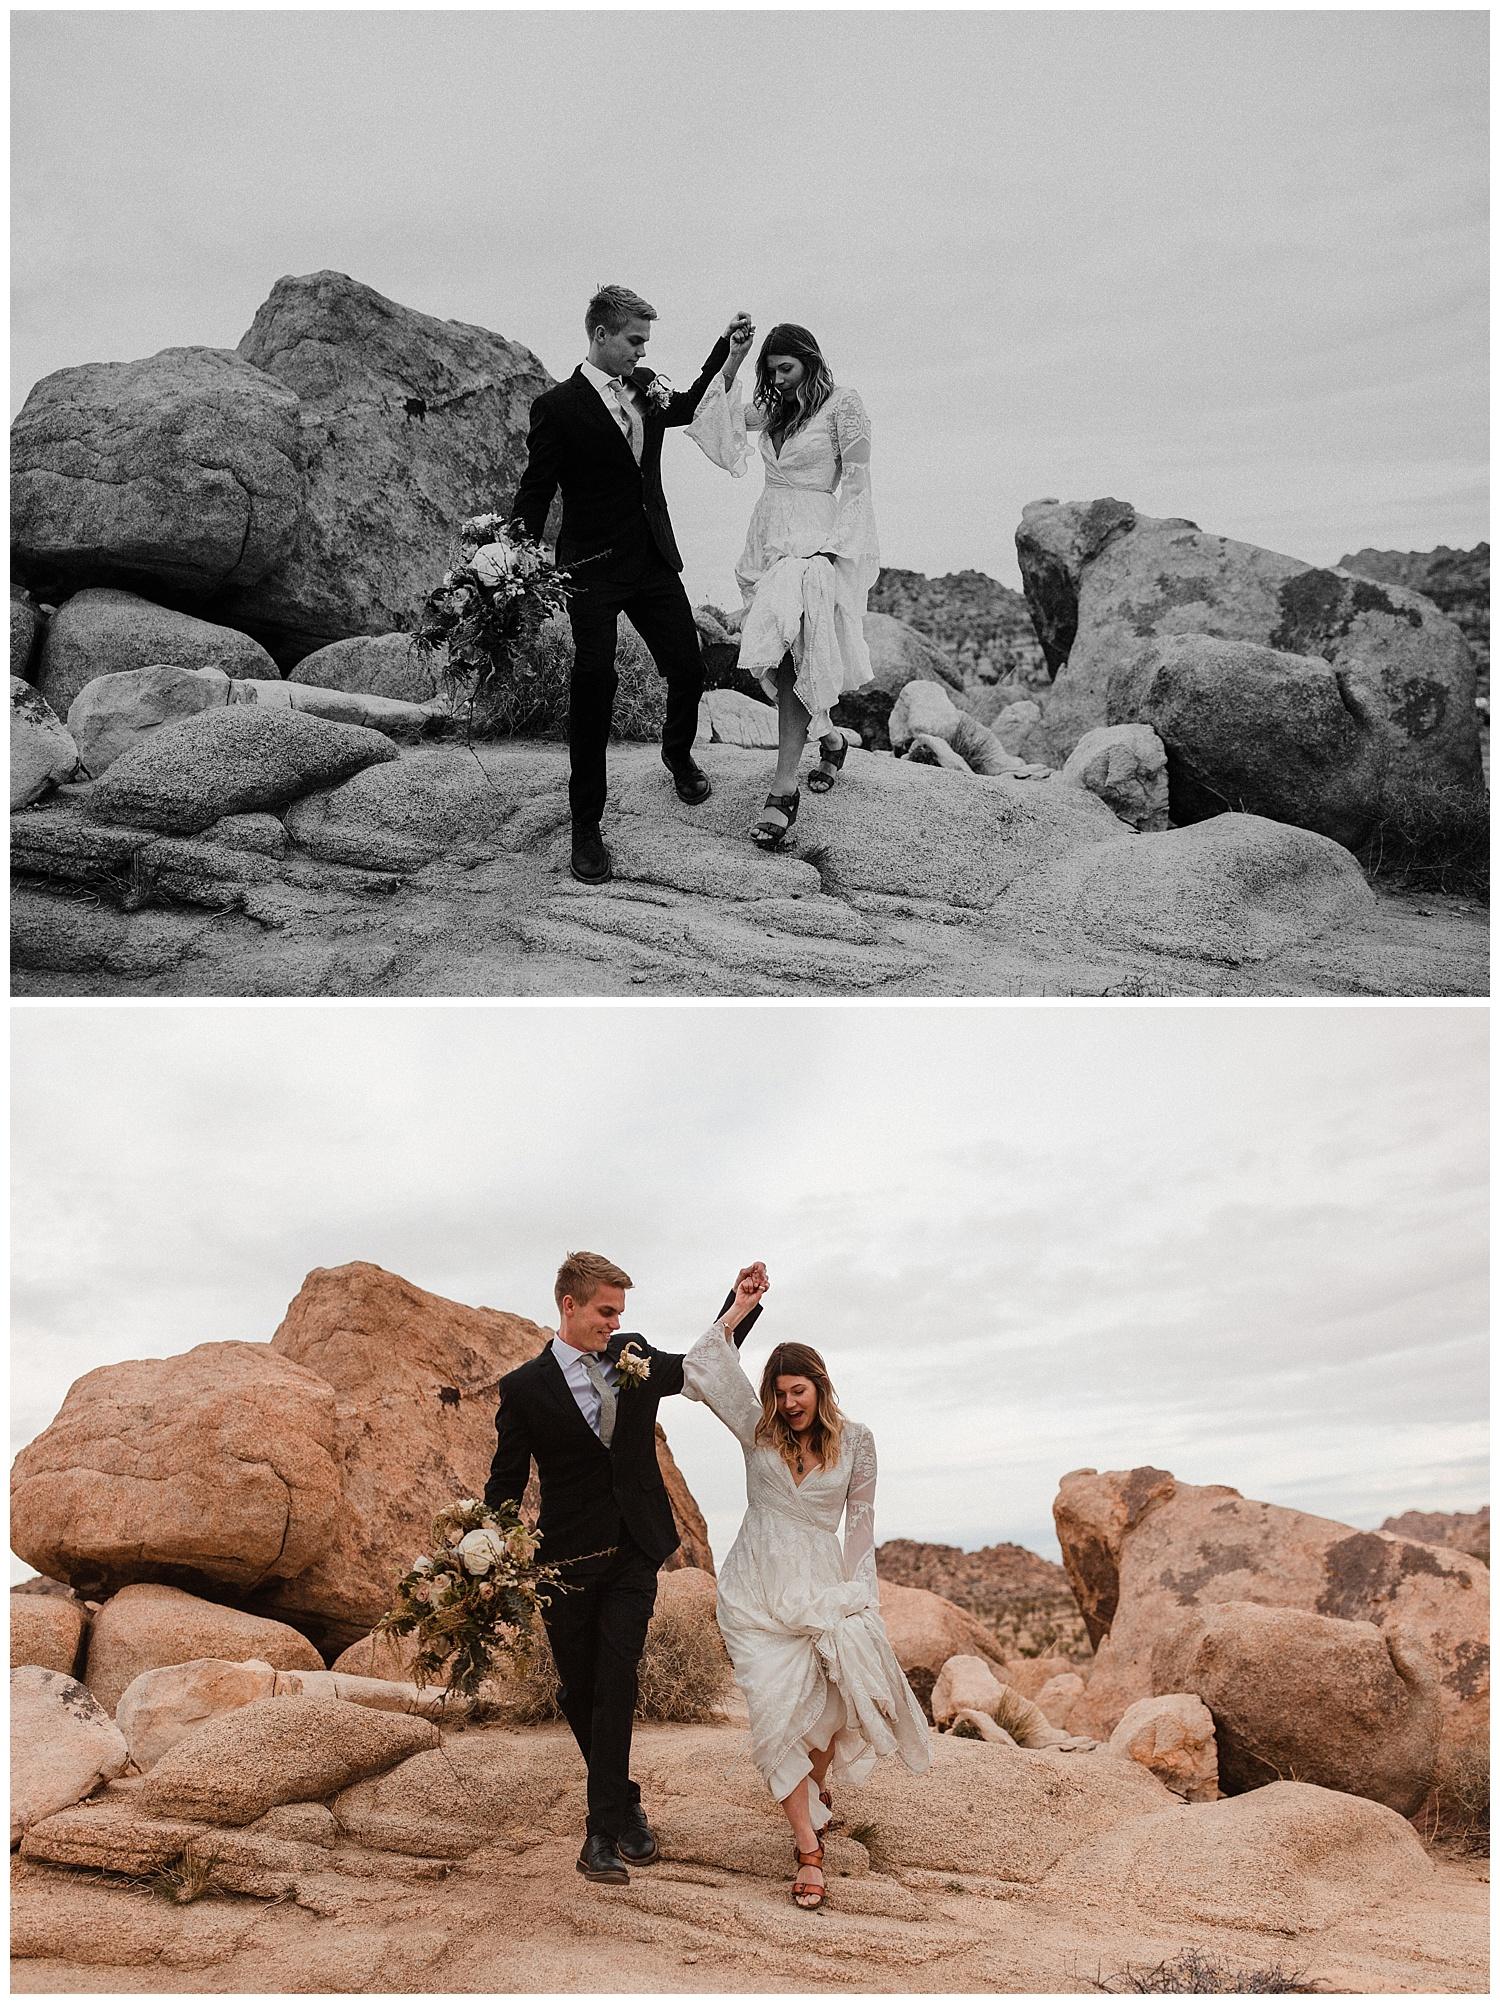 romantic_elopement_joshua_tree_adventurous_wedding_photographer_romantic_intimate_wedding_0018.jpg